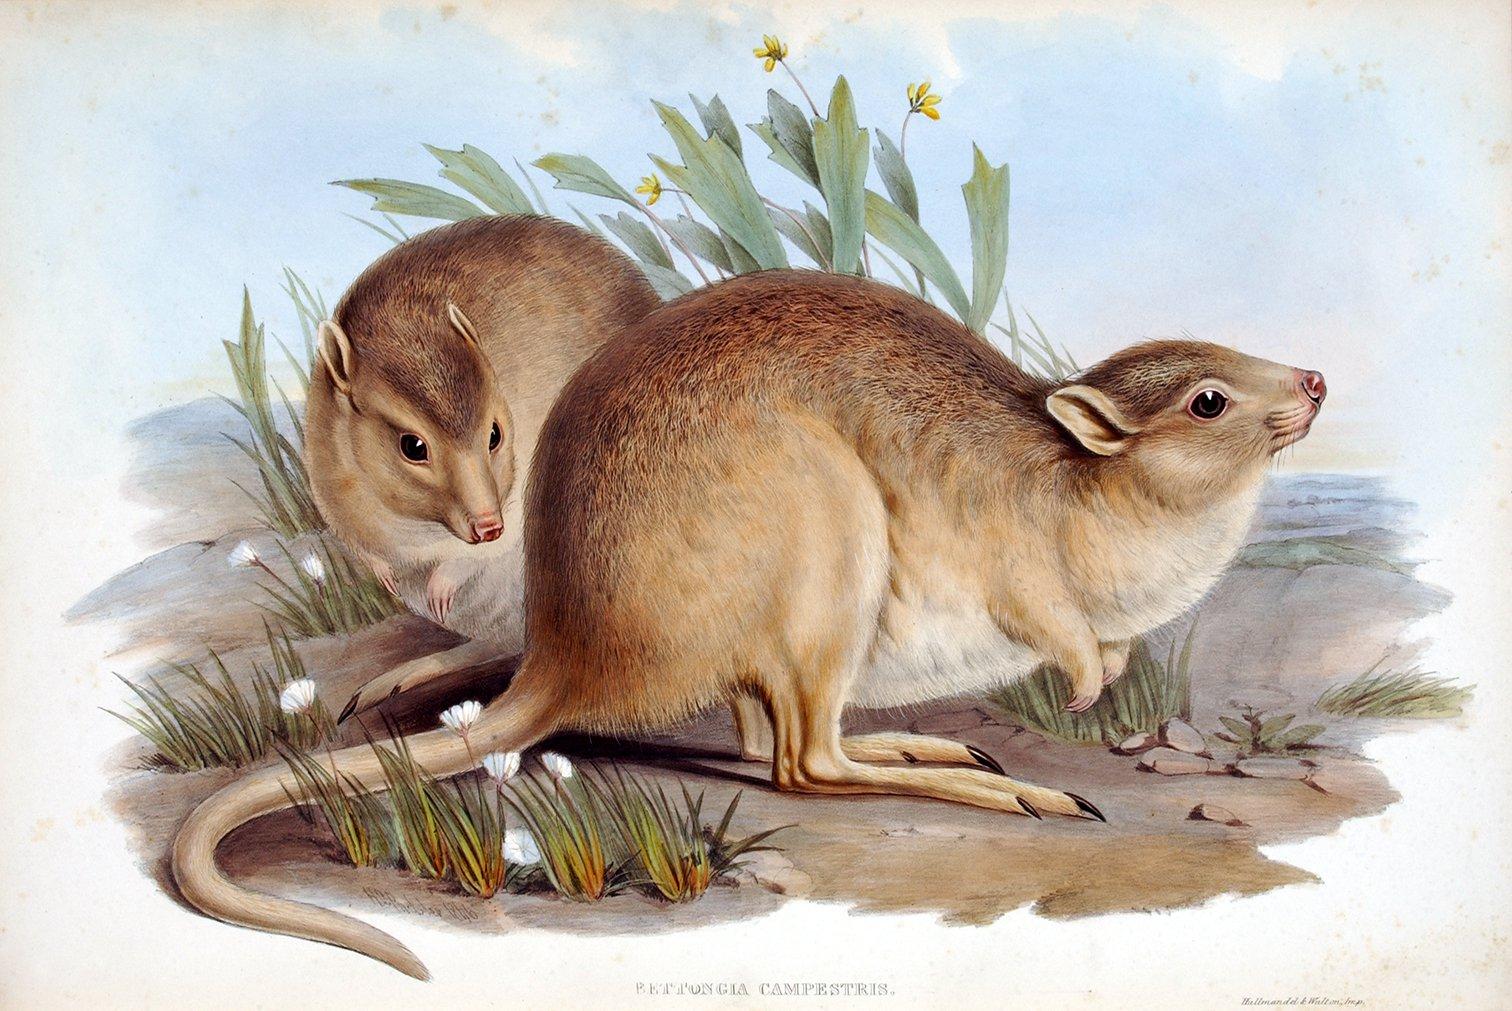 Painting of desert rat kangaroos from John Gould's Mammals of Australia